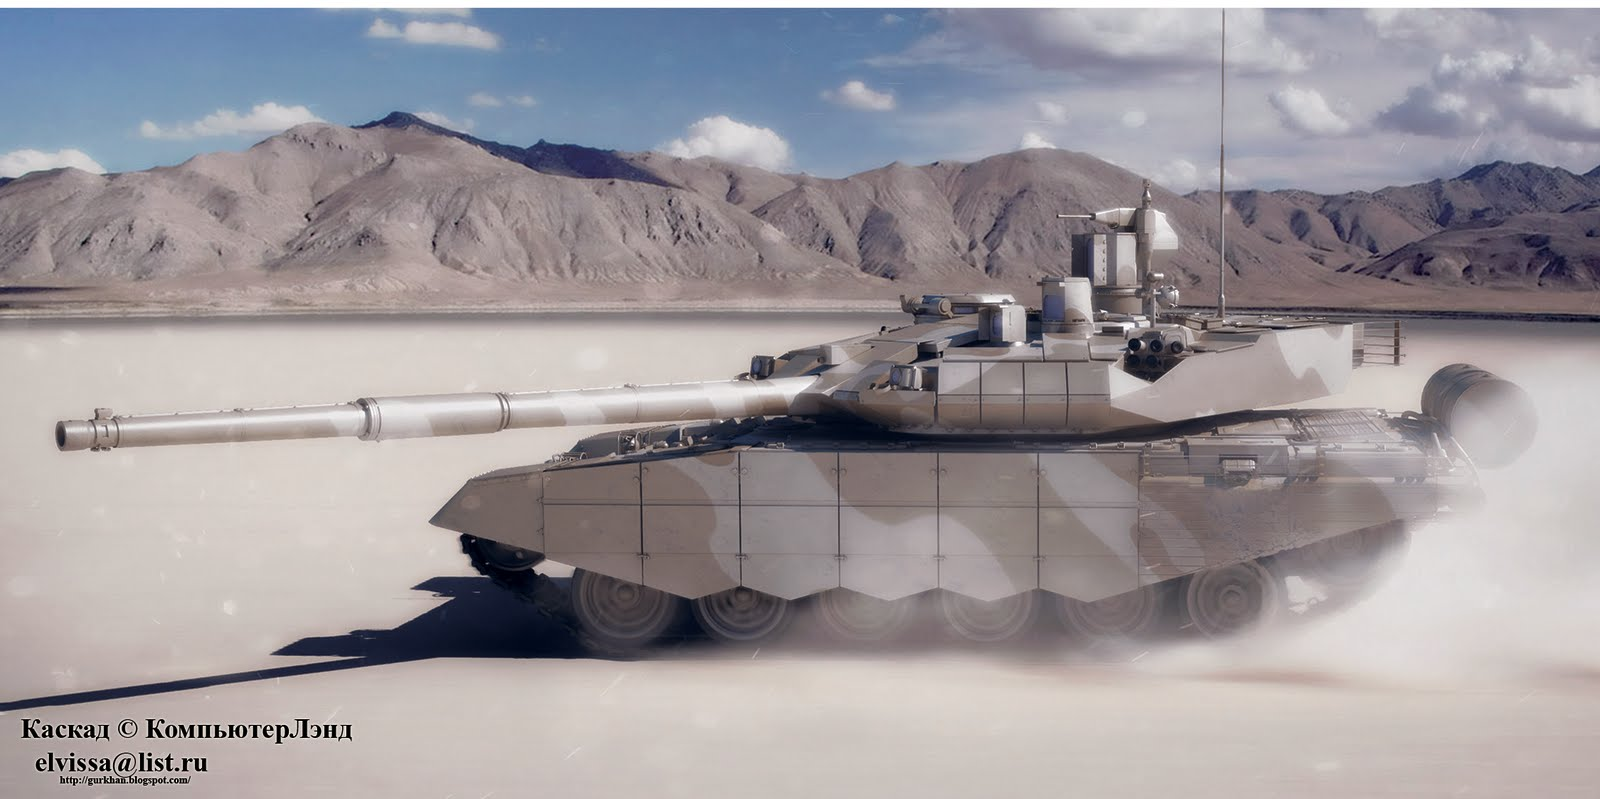 الجزائر توقع عقدا لشراء 300 دبابة  تي 90  والاحتمال انها  نوع T90MS T-90MS_rus-15